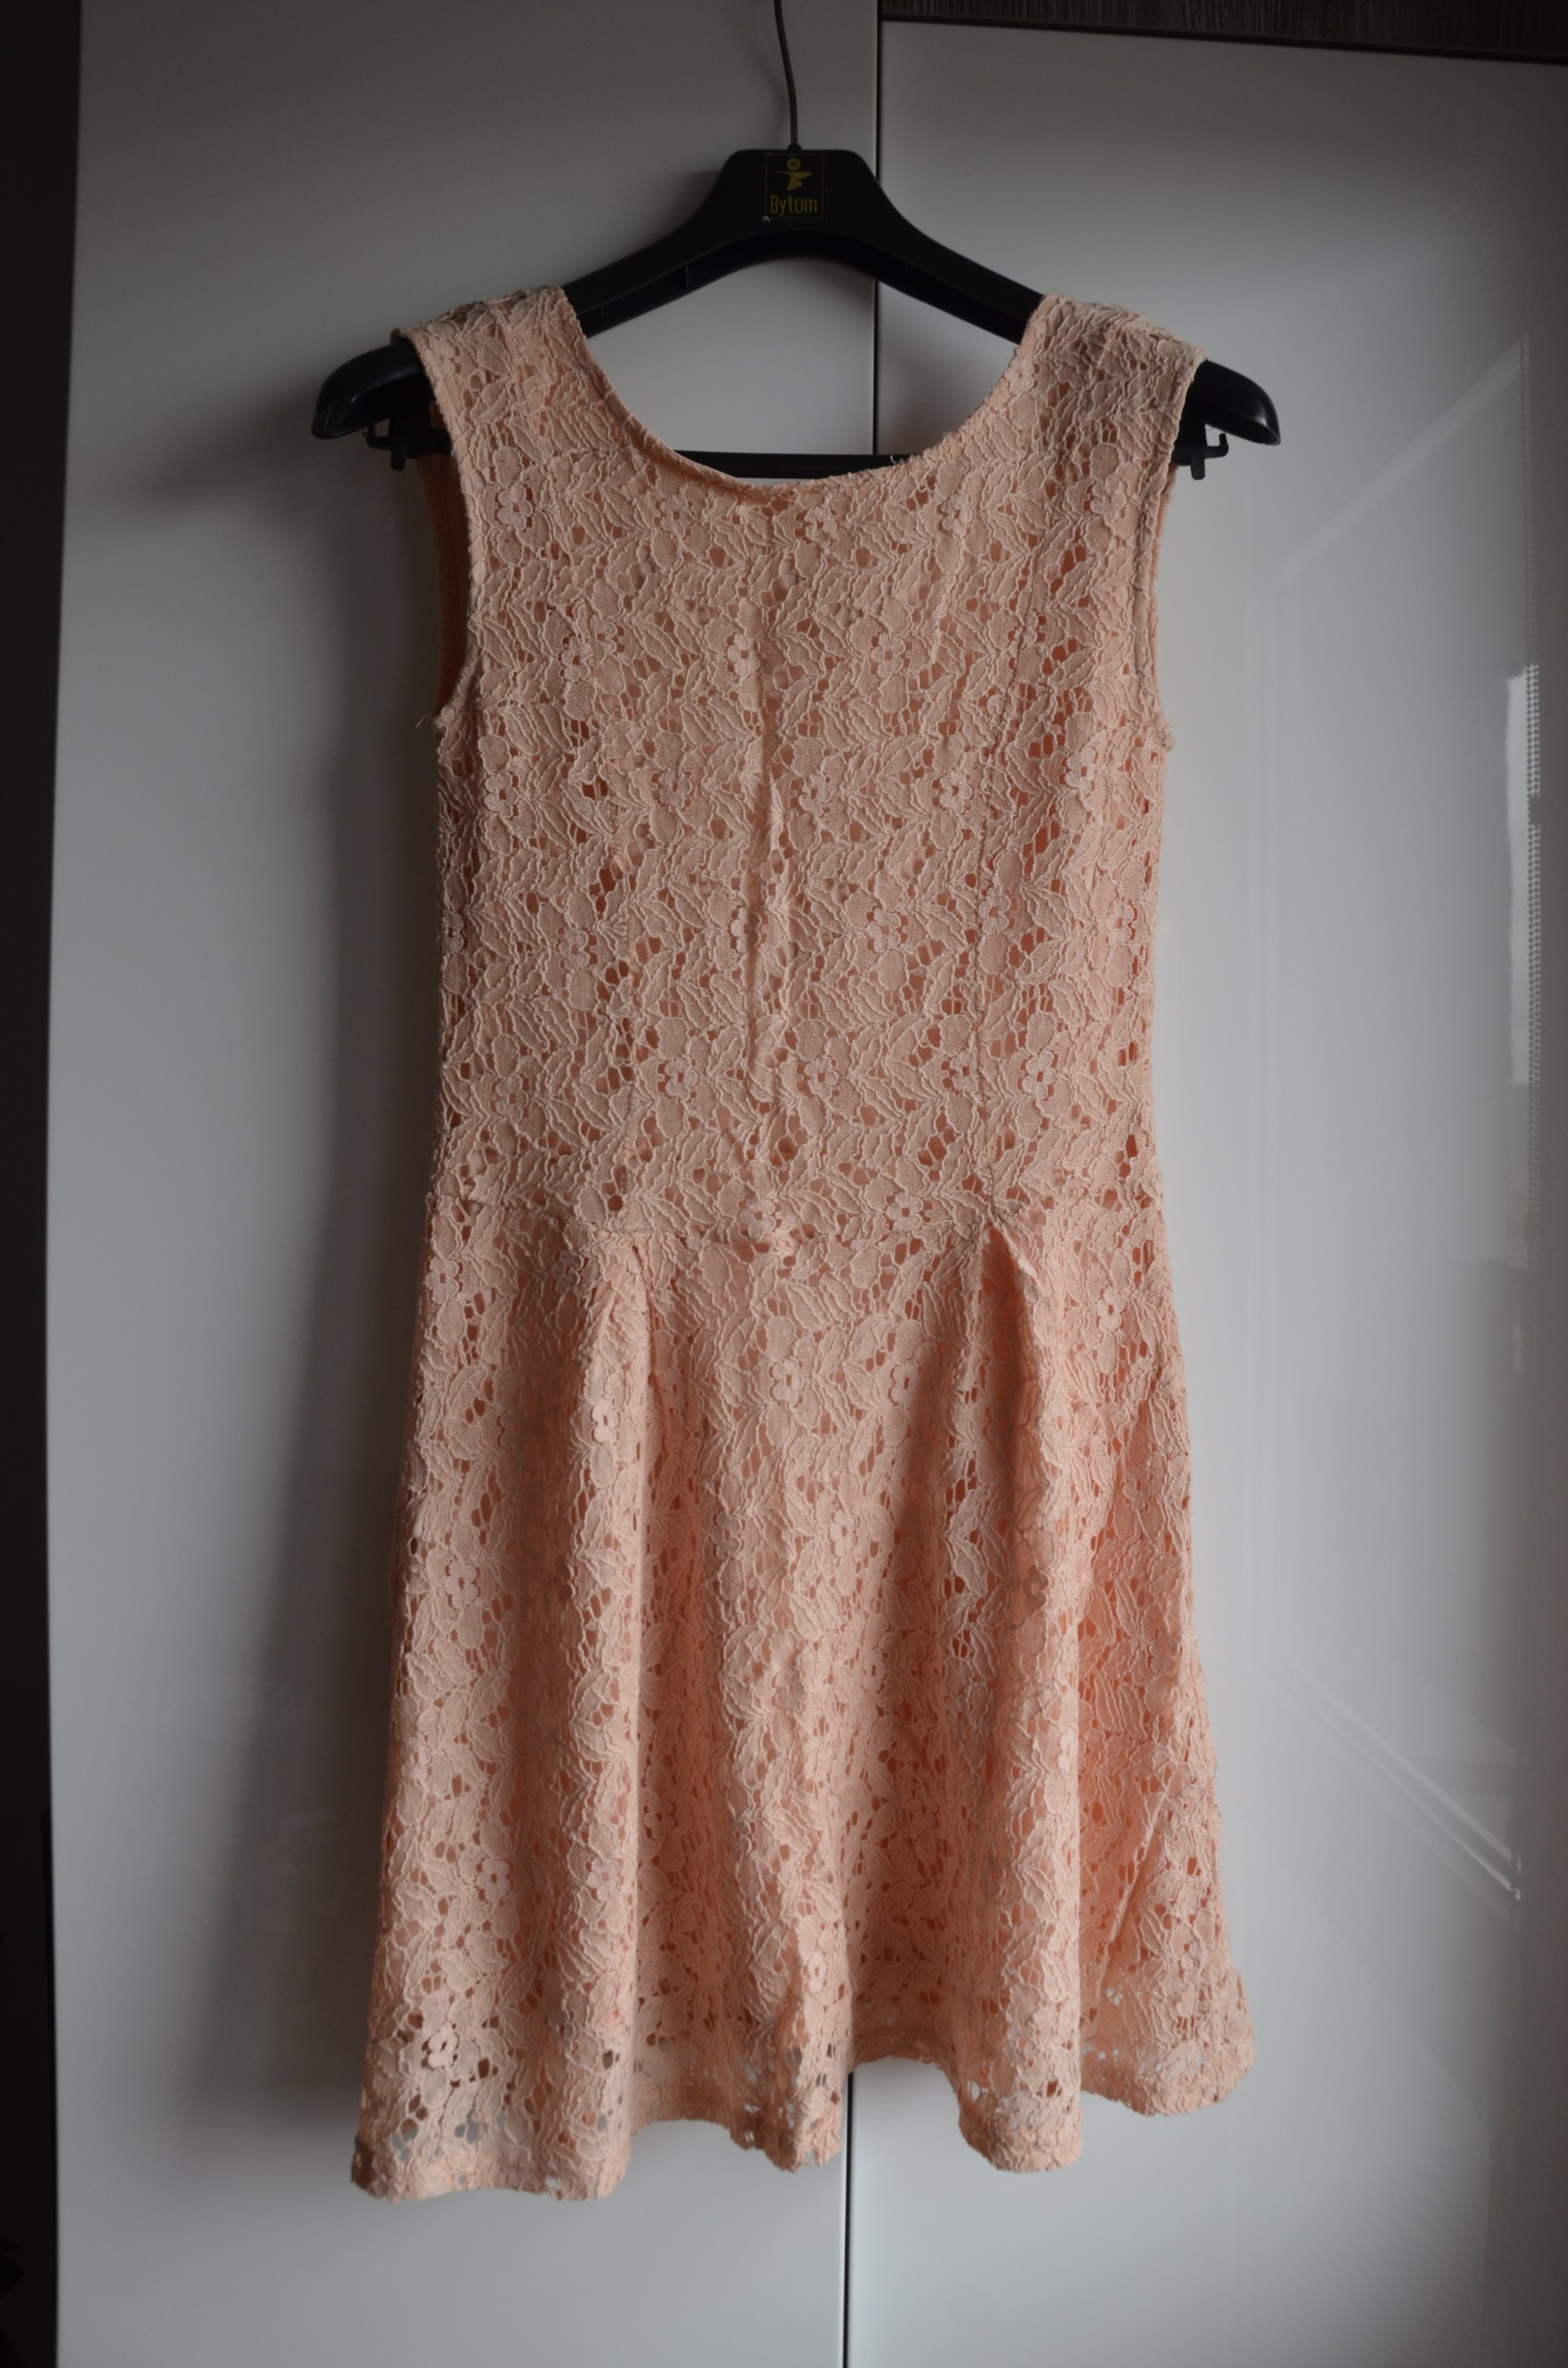 65f06fb884 Sukienka rozkloszowana koronkowa lato Sinsay 34 36 - 7422996810 ...